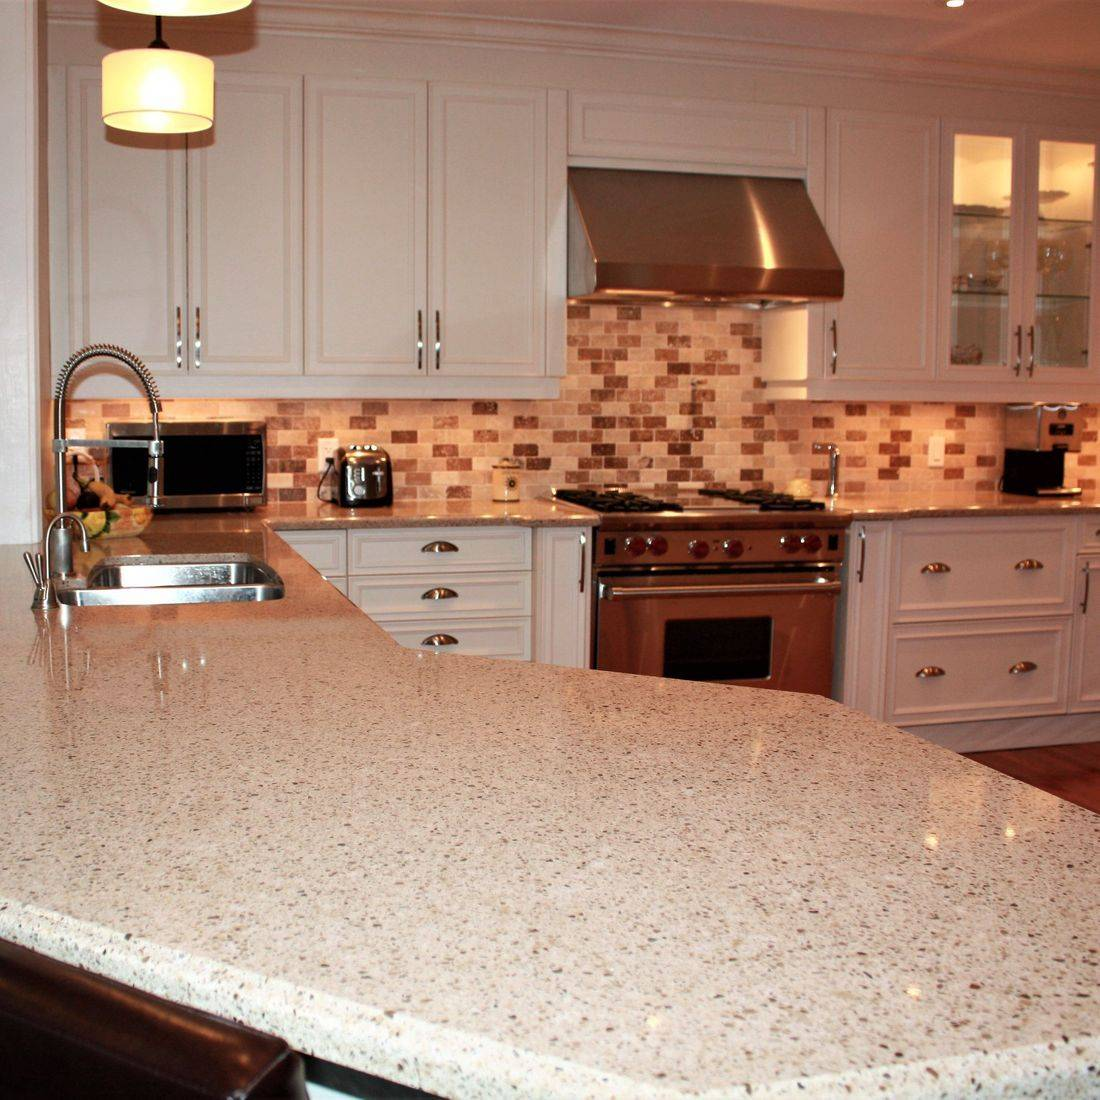 Sibra Kitchens Markham Toronto cabinets